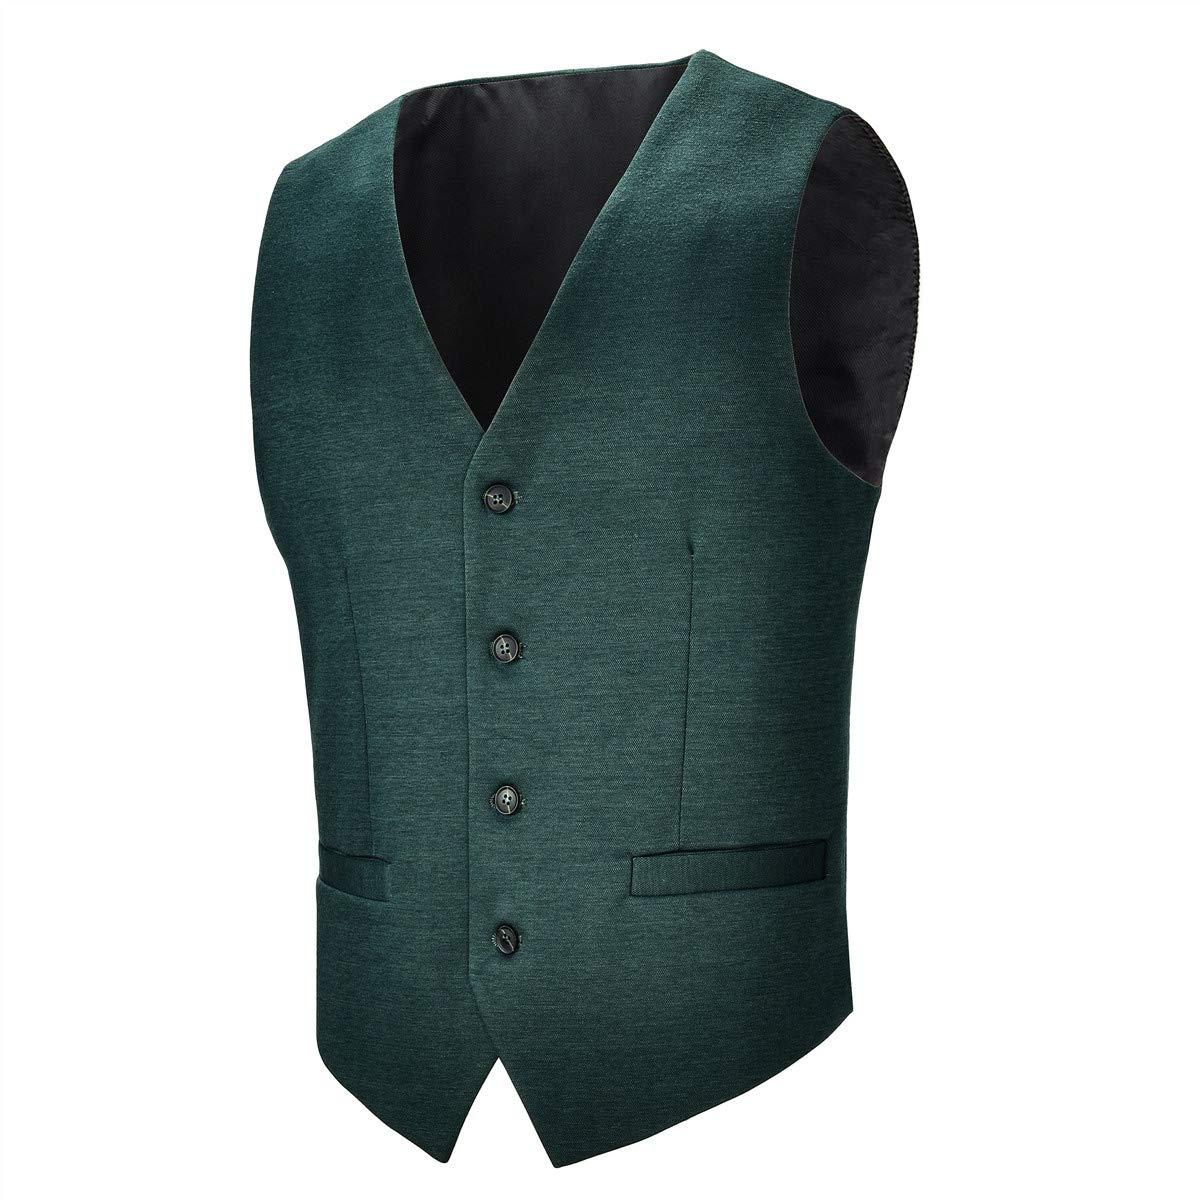 BOTVELA Mens Casual Dress Vest 4 Button Waistcoat (Dark Green, L) by BOTVELA